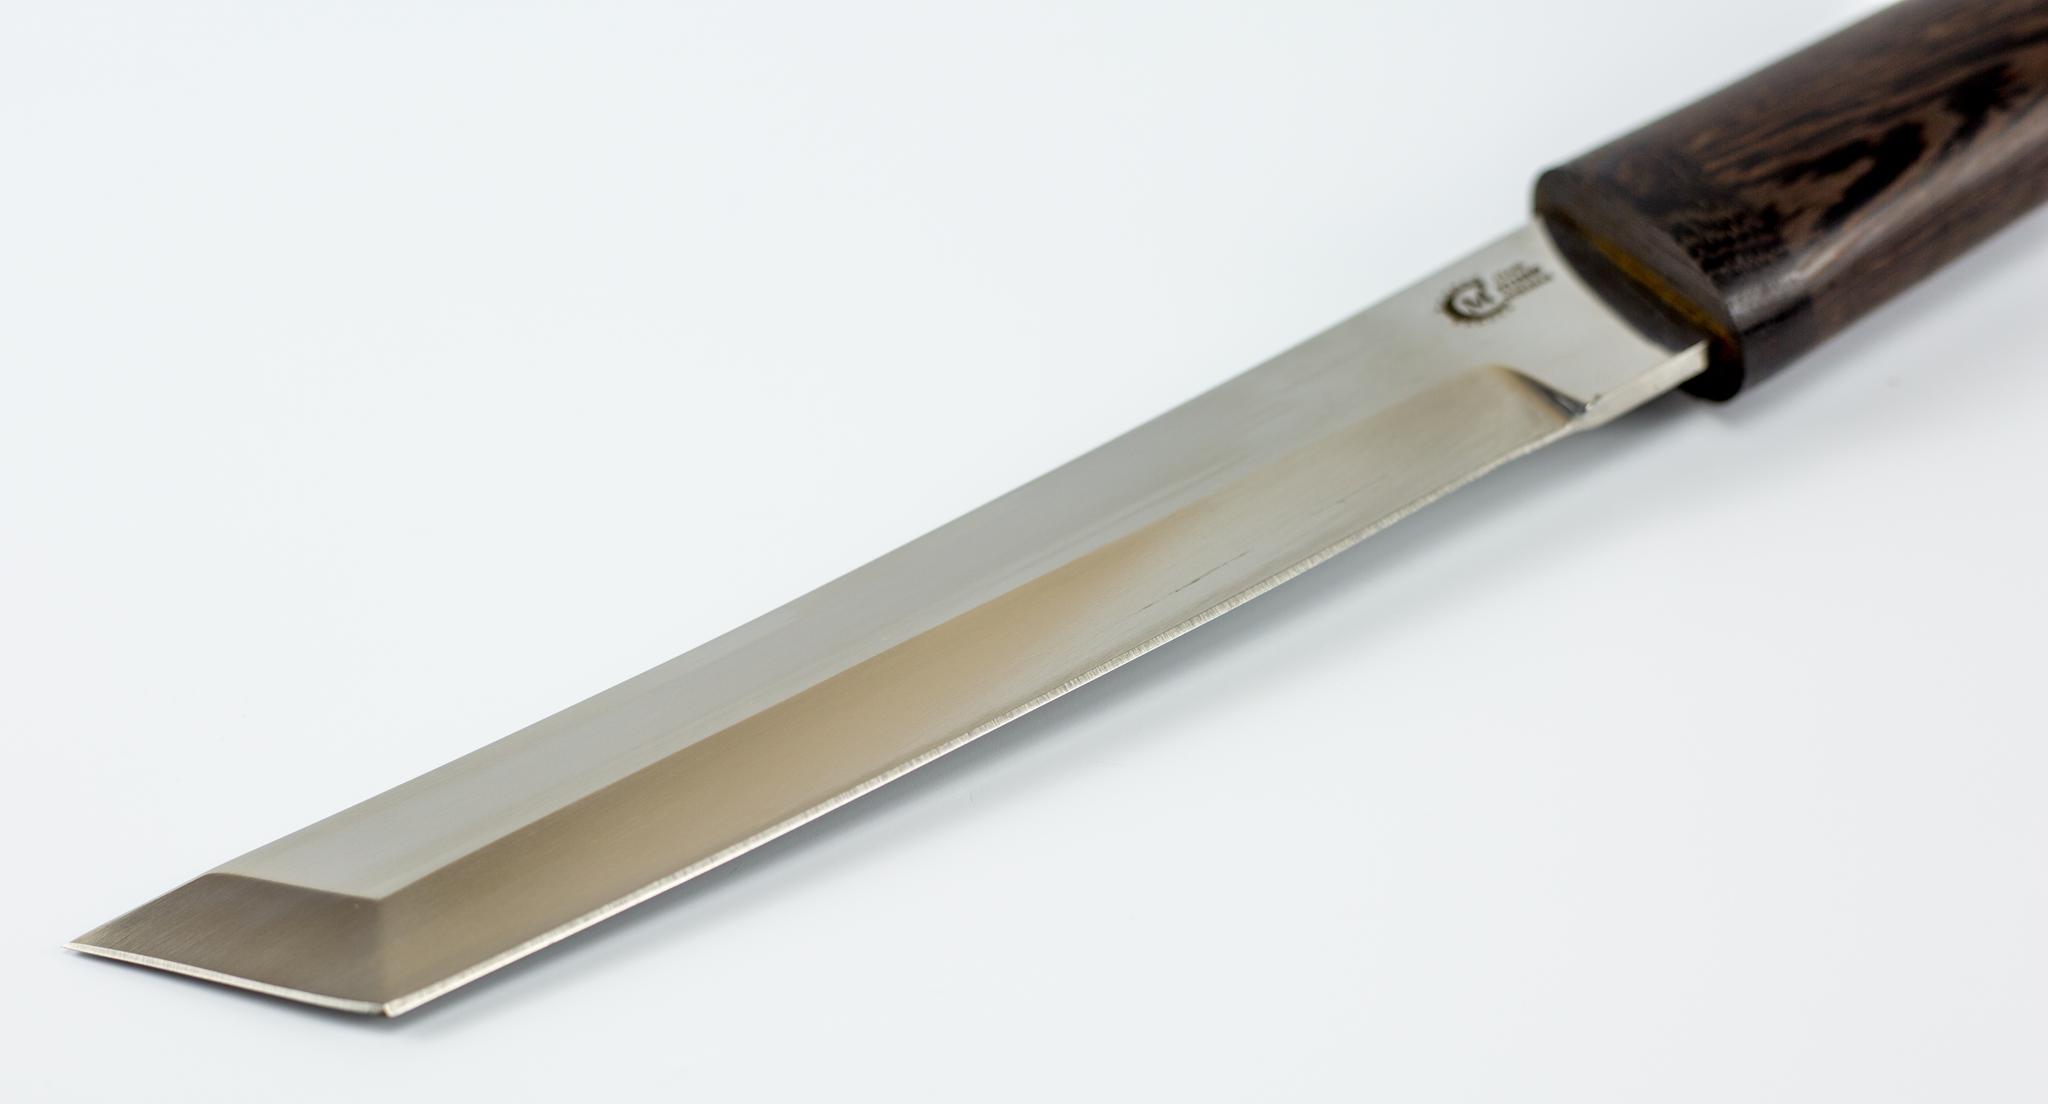 Фото 10 - Нож Танто из Х12МФ, рукоять и ножны граб от Кузница Семина